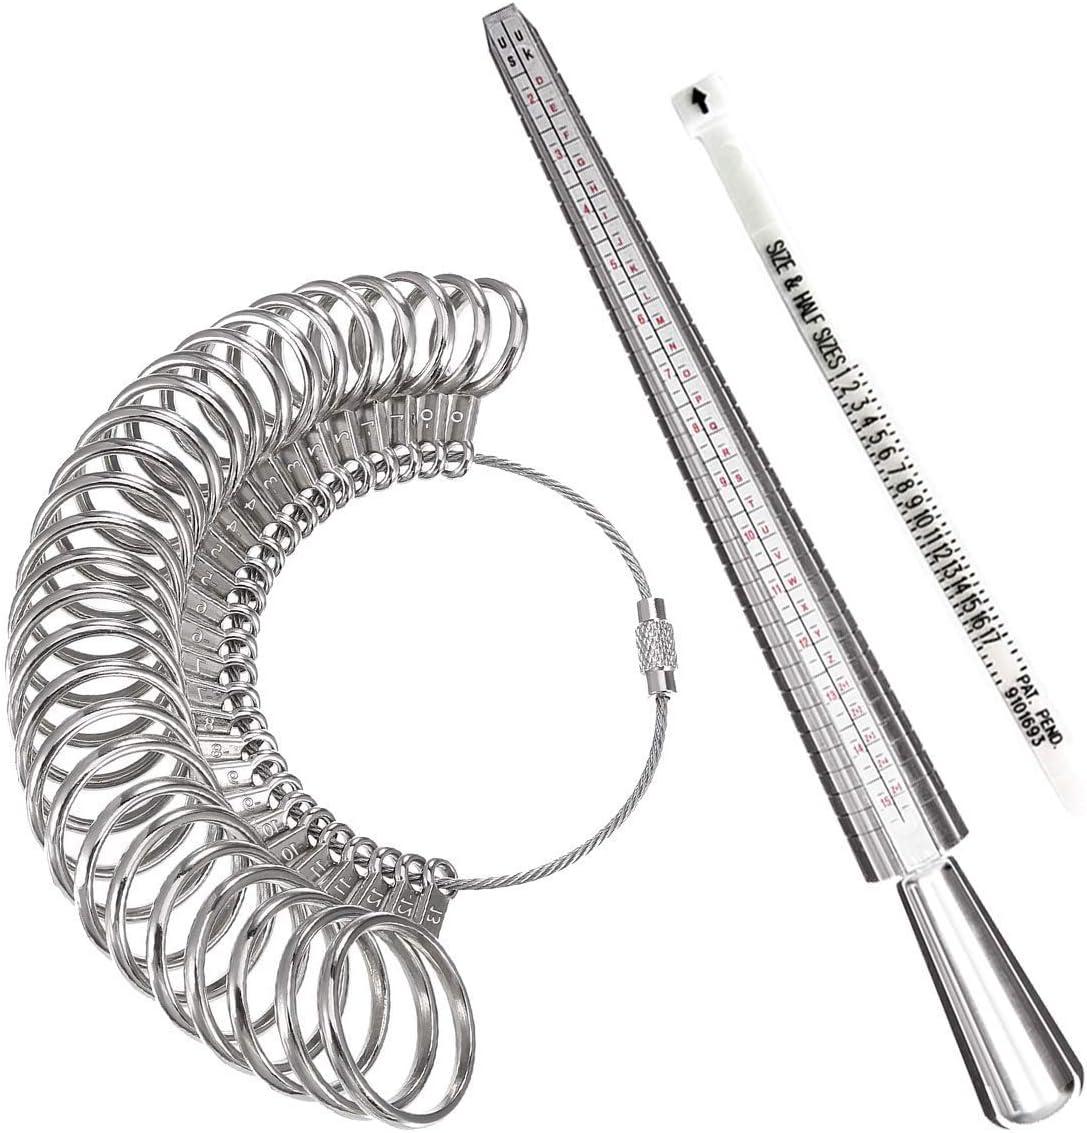 Meowoo Ring Sizer Measuring Tool Aluminum Sale Finge and Mandrel Washington Mall